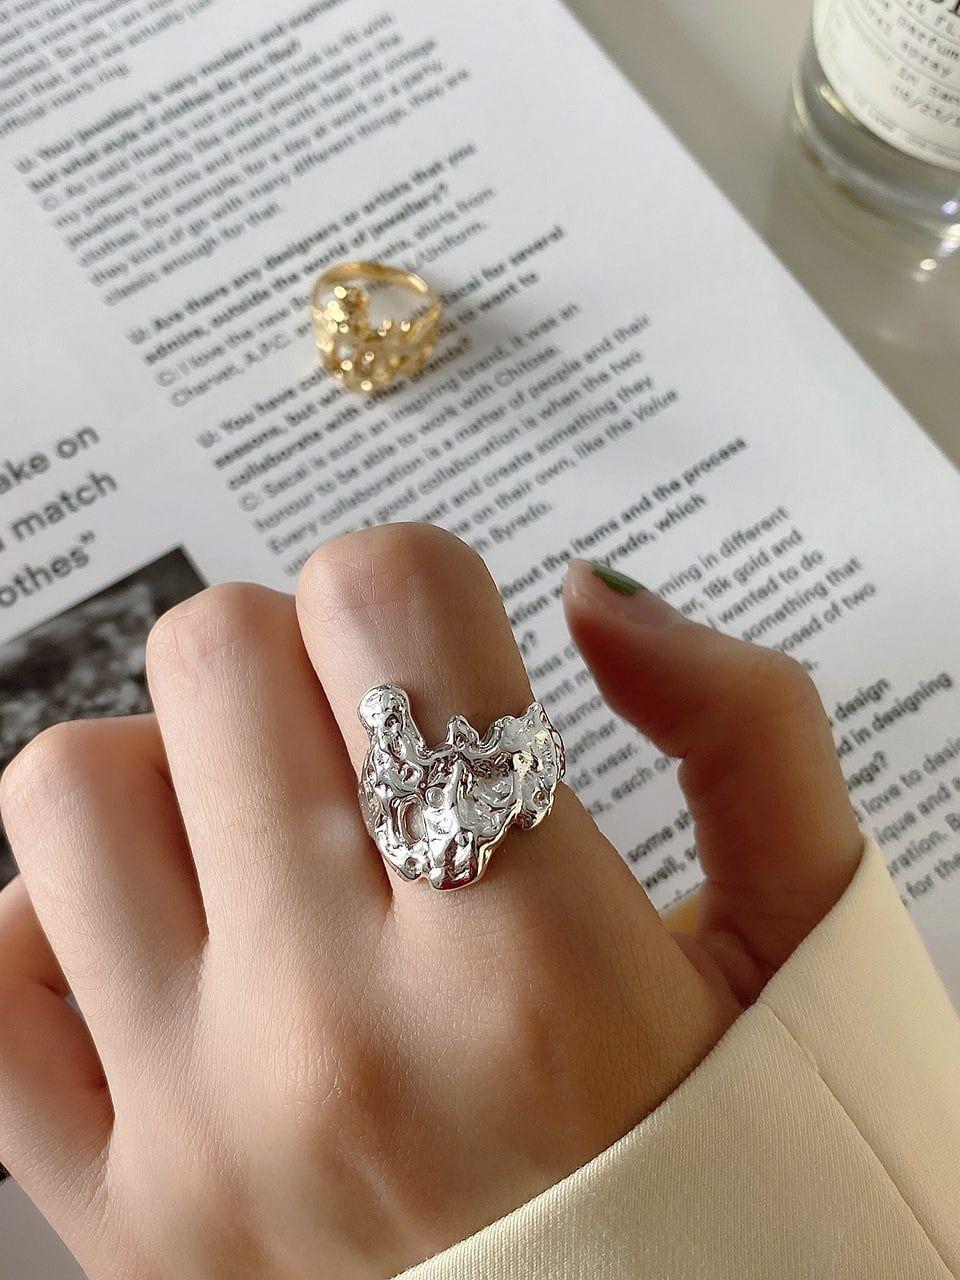 925 Sterling Silver Vintage Irregular Texture Free Size Ring In 2020 925 Sterling Silver Silver Jewels 925 Sterling